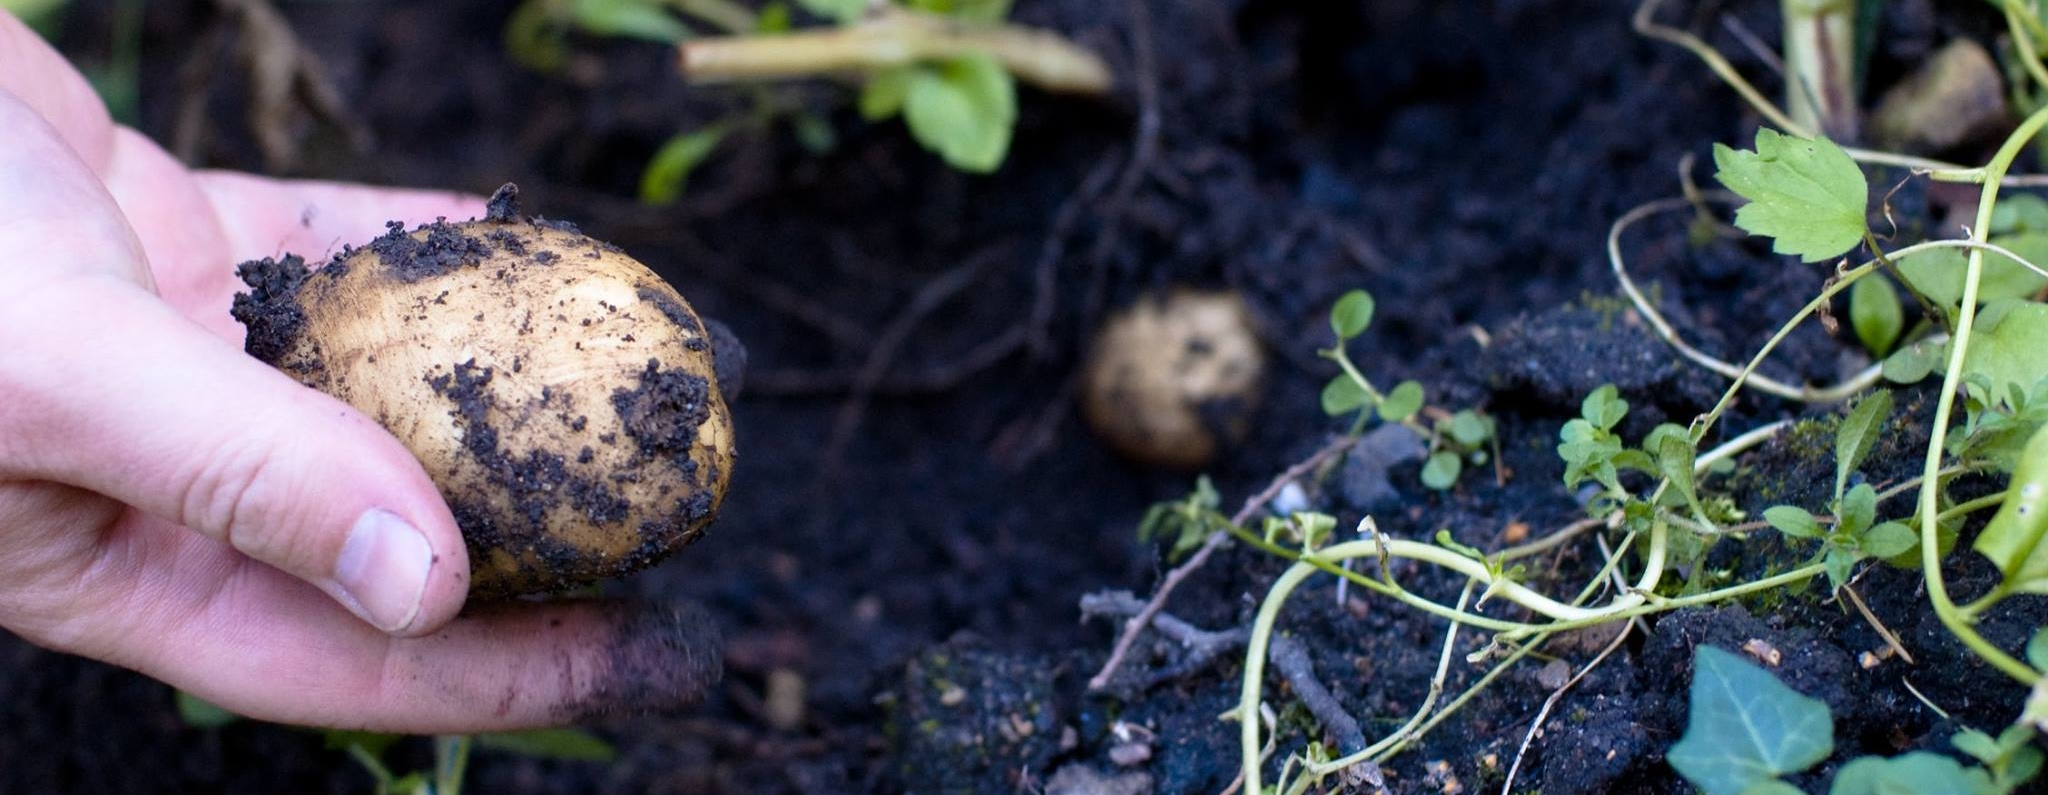 Kartoffel i aGRO-haven - foto af Rebecca Ann Kaagh